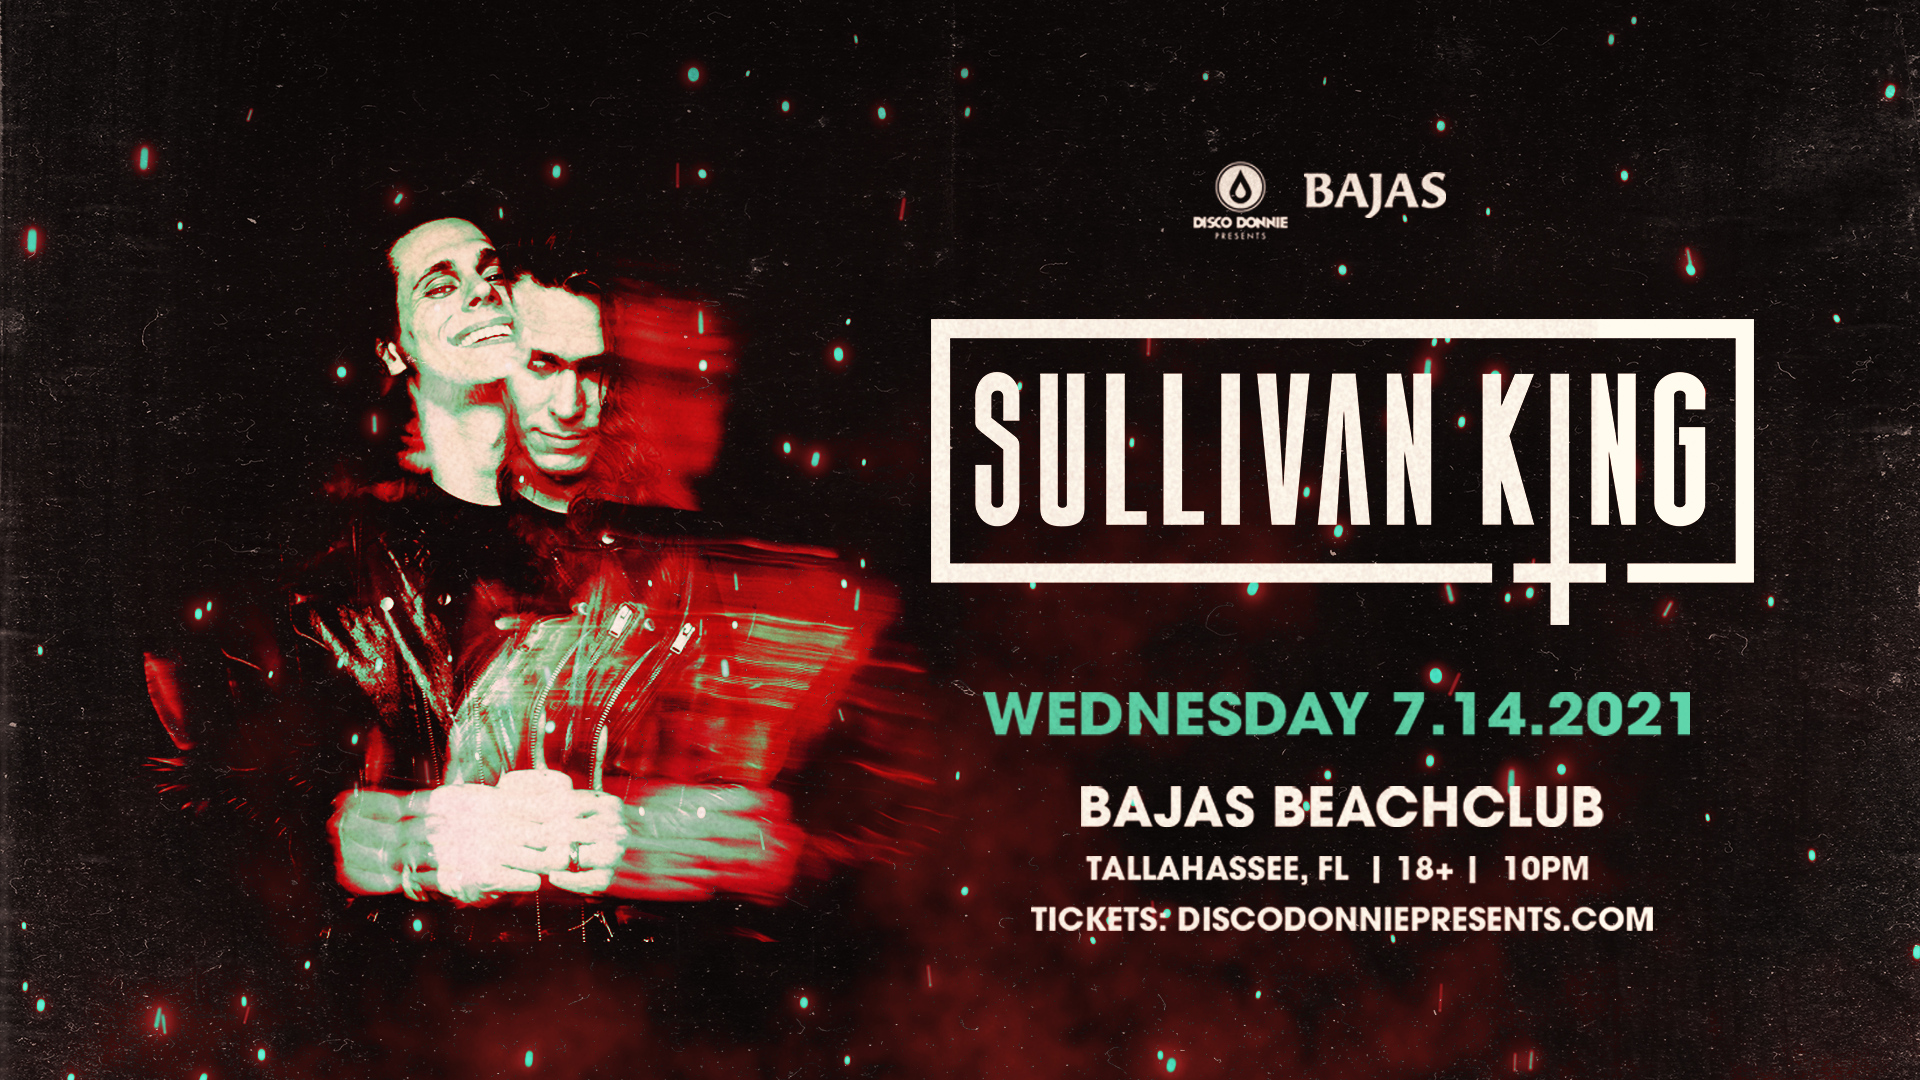 Sullivan King, Bajas, Event